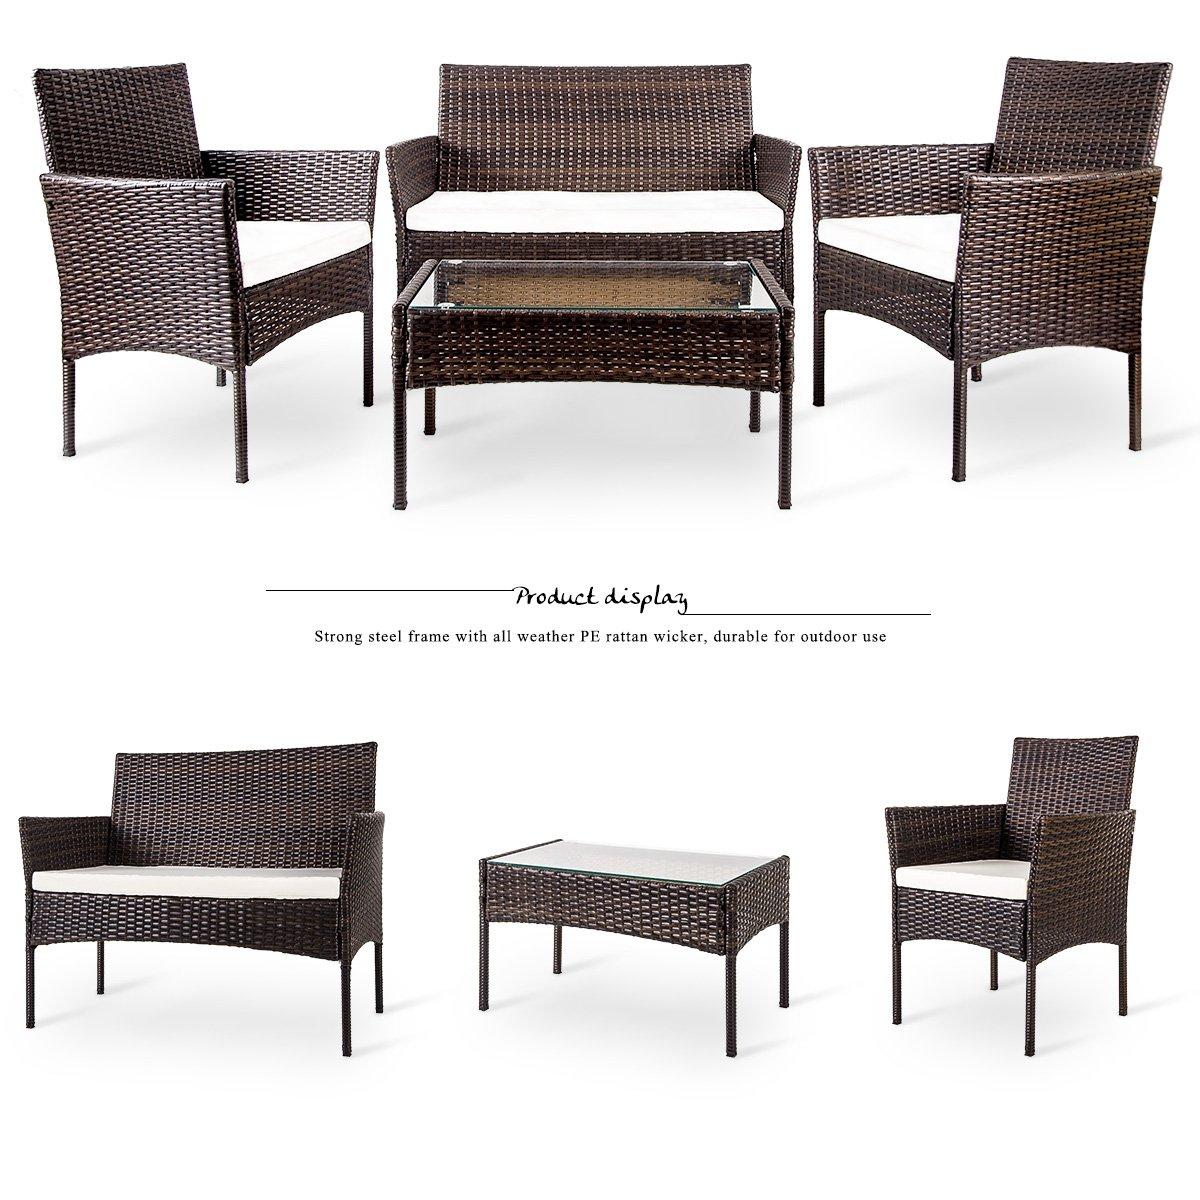 Merax 4 PC Outdoor Garden Rattan Patio Furniture Set Cushioned Seat Wicker Sofa (Brown) by Merax (Image #2)